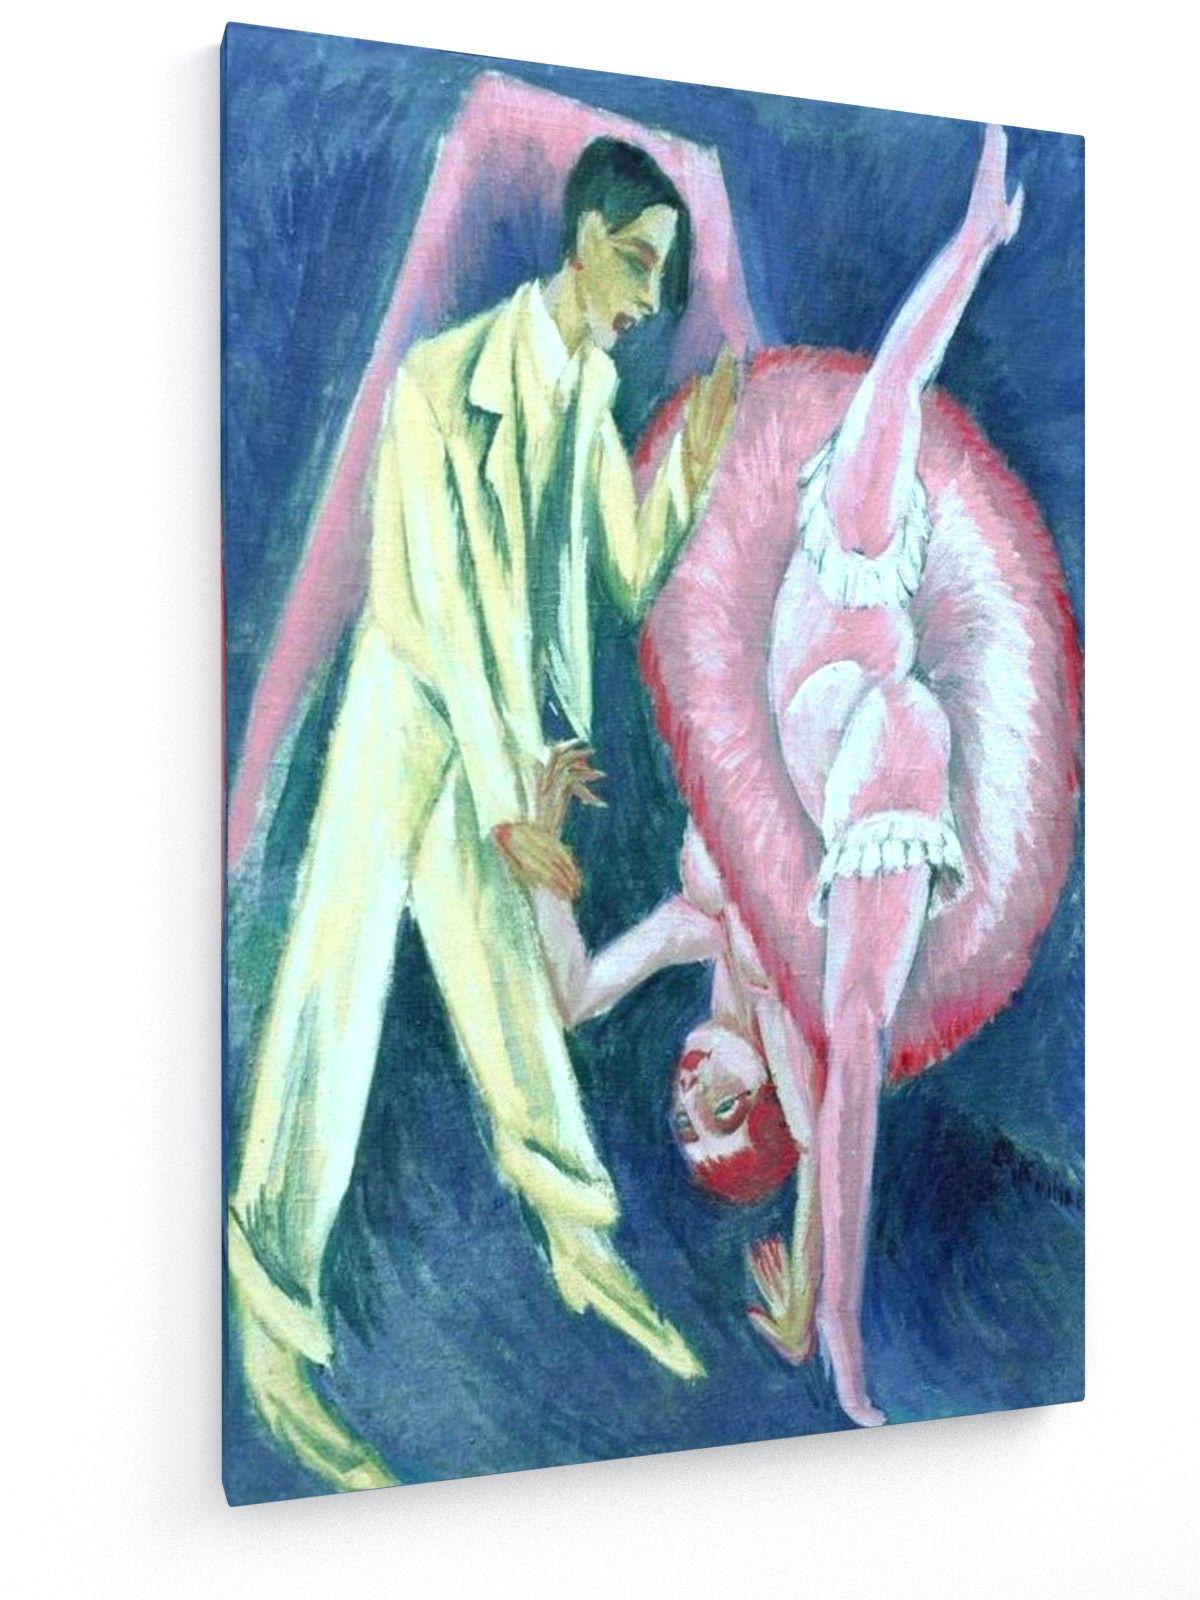 Textil-Leinwandbild - Ernst Ludwig Kirchner, Tanzpaar